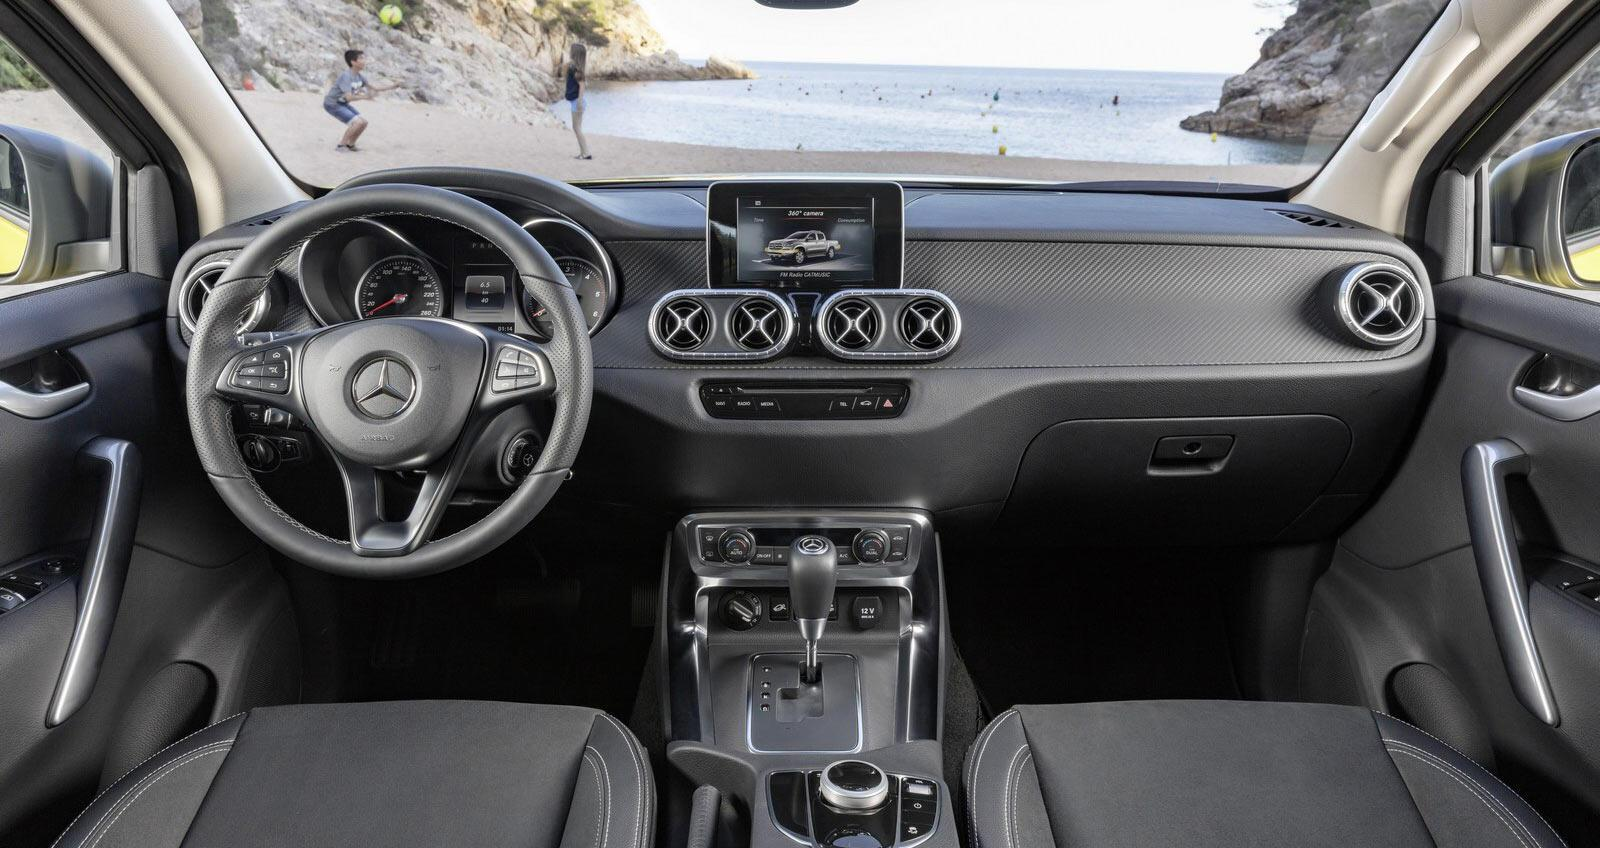 Ảnh chi tiết Mercedes-Benz X-Class - Hình 2